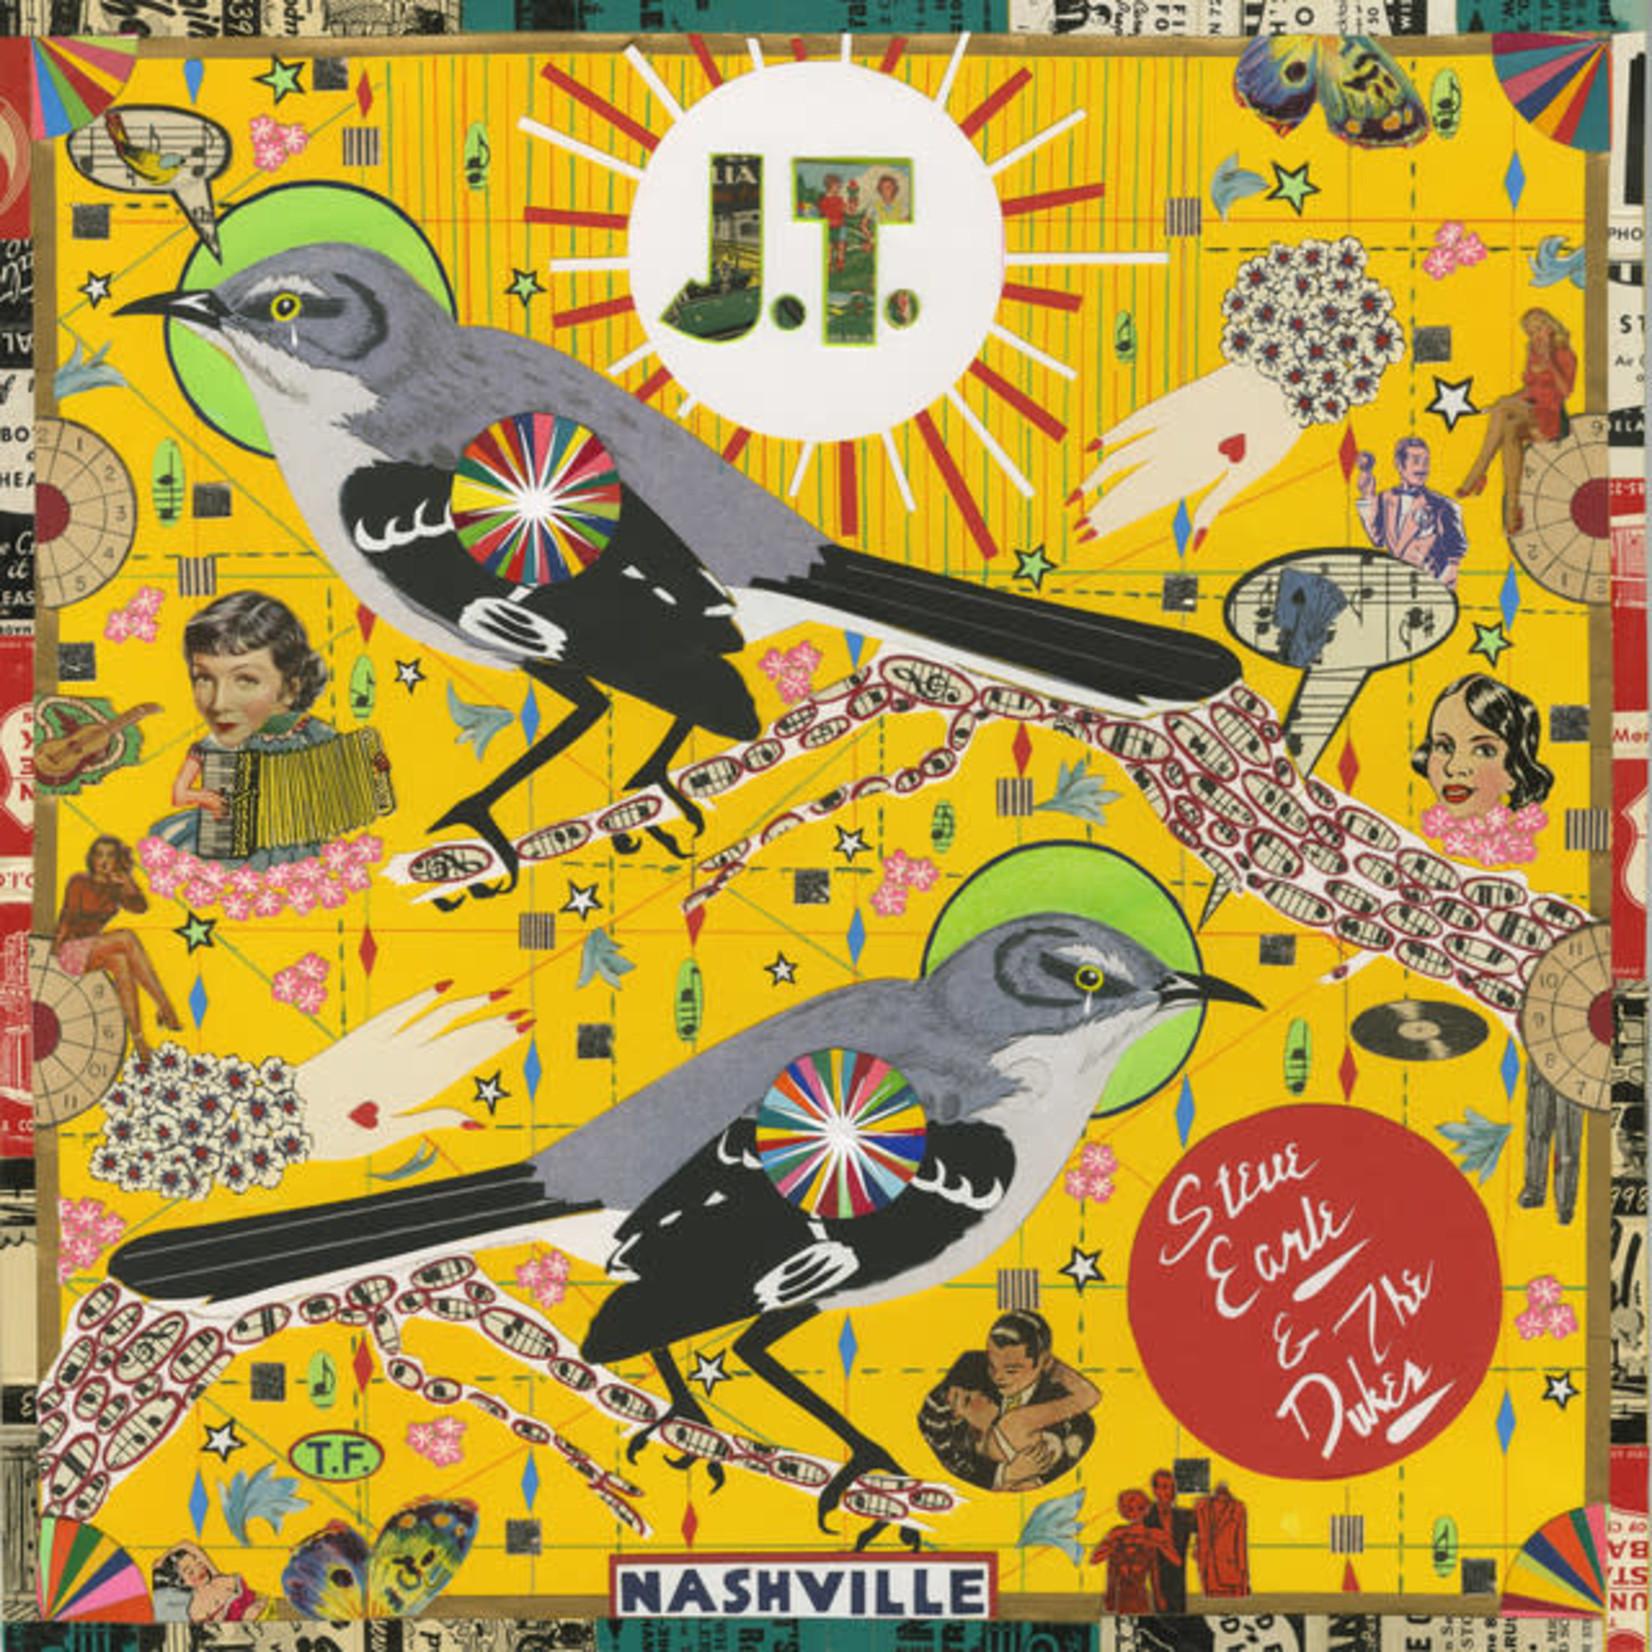 Vinyl Steve Earle & The Dukes  - J. T. (Indie Store Version)